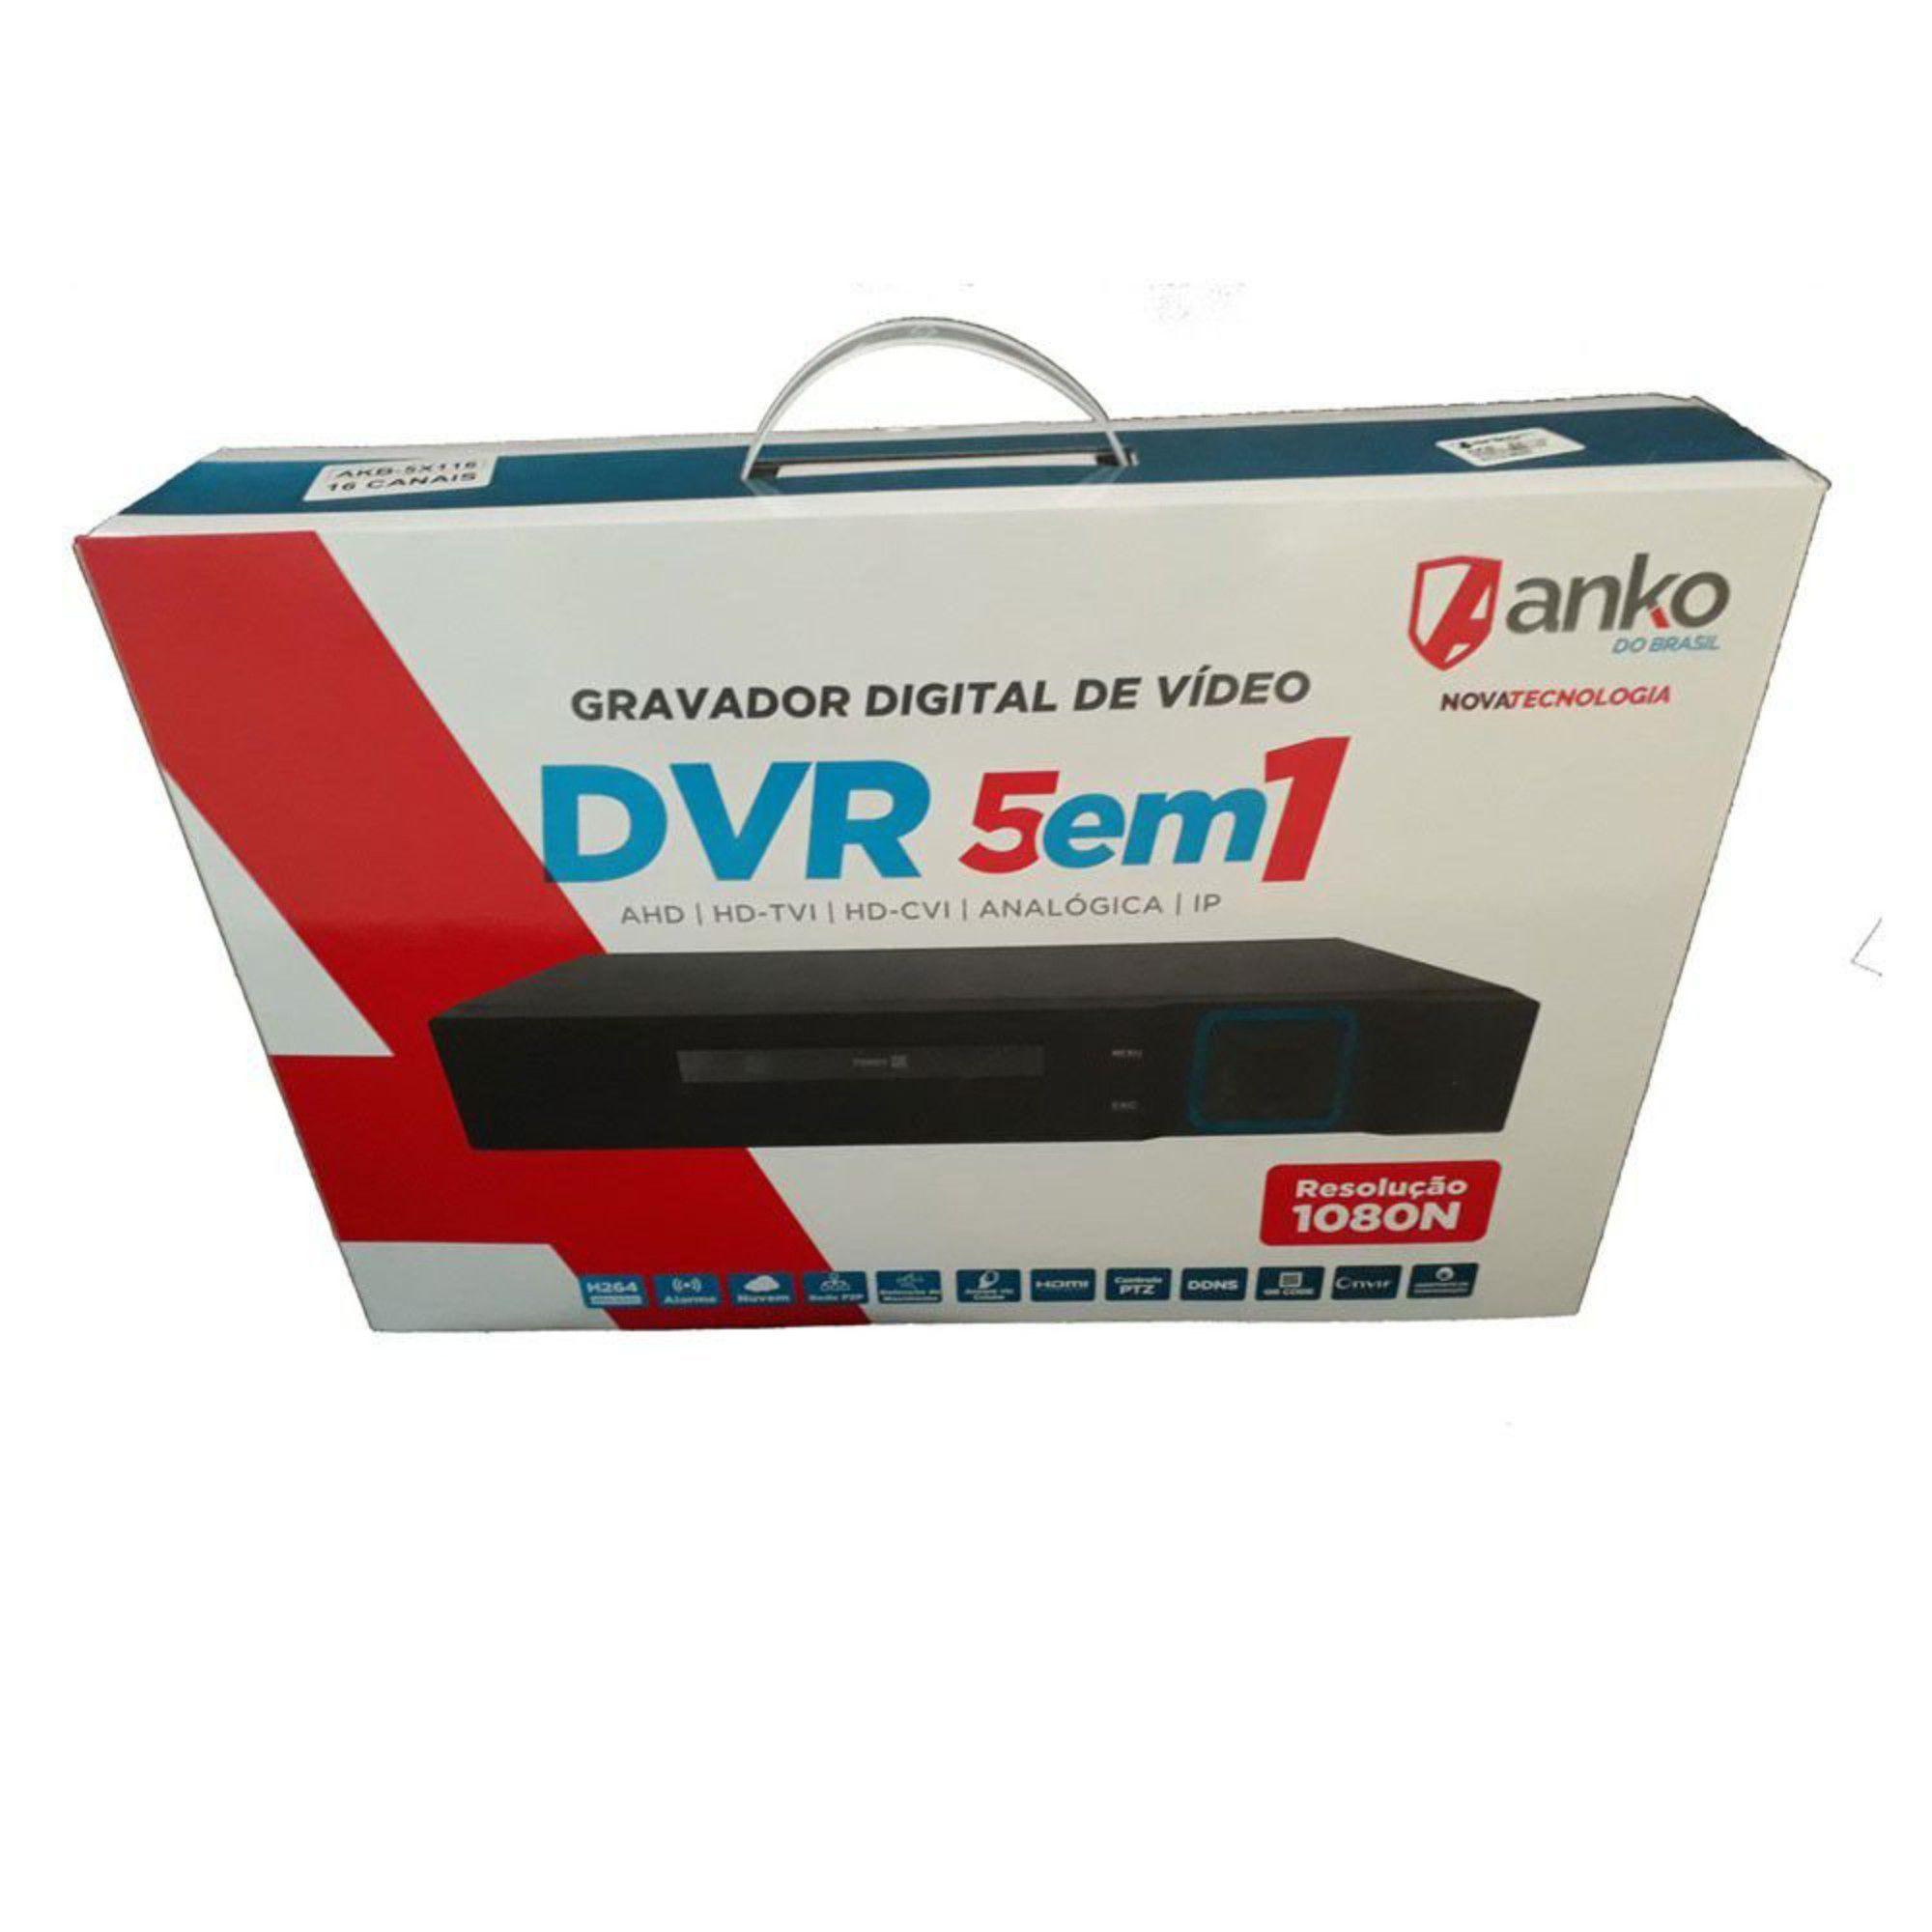 DVR Stand Alone 8 Canais Anko Full HD 1080n 5 em 1